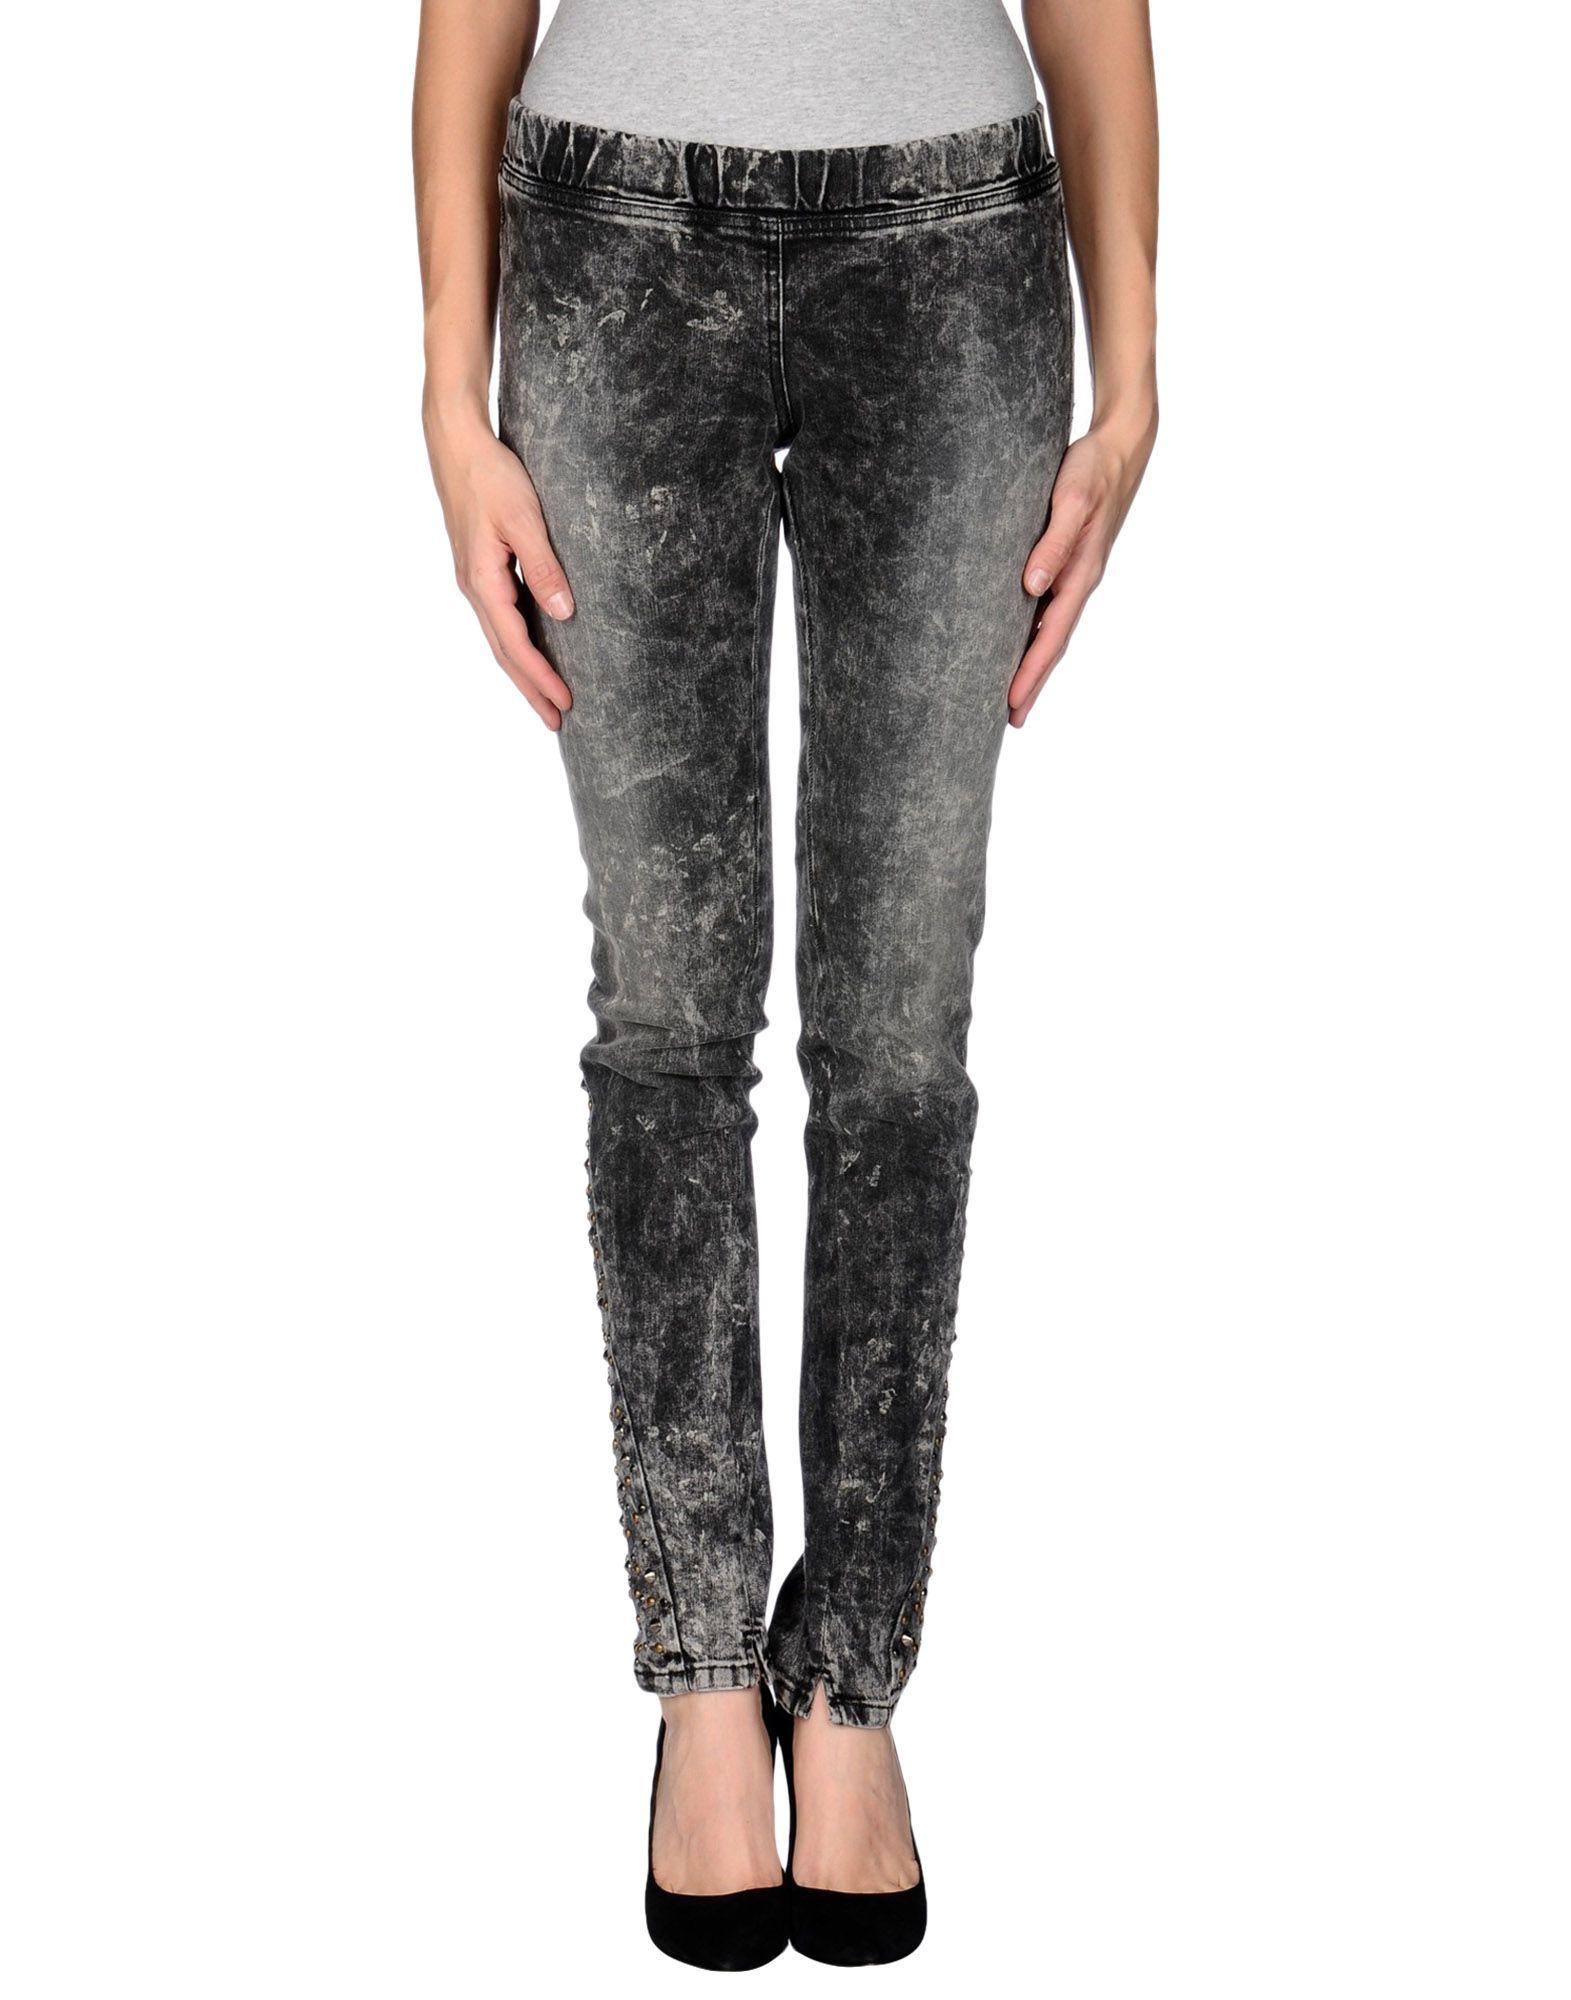 LOIZA by PATRIZIA PEPE Джинсовые брюки брюки quelle patrizia dini by heine 157610